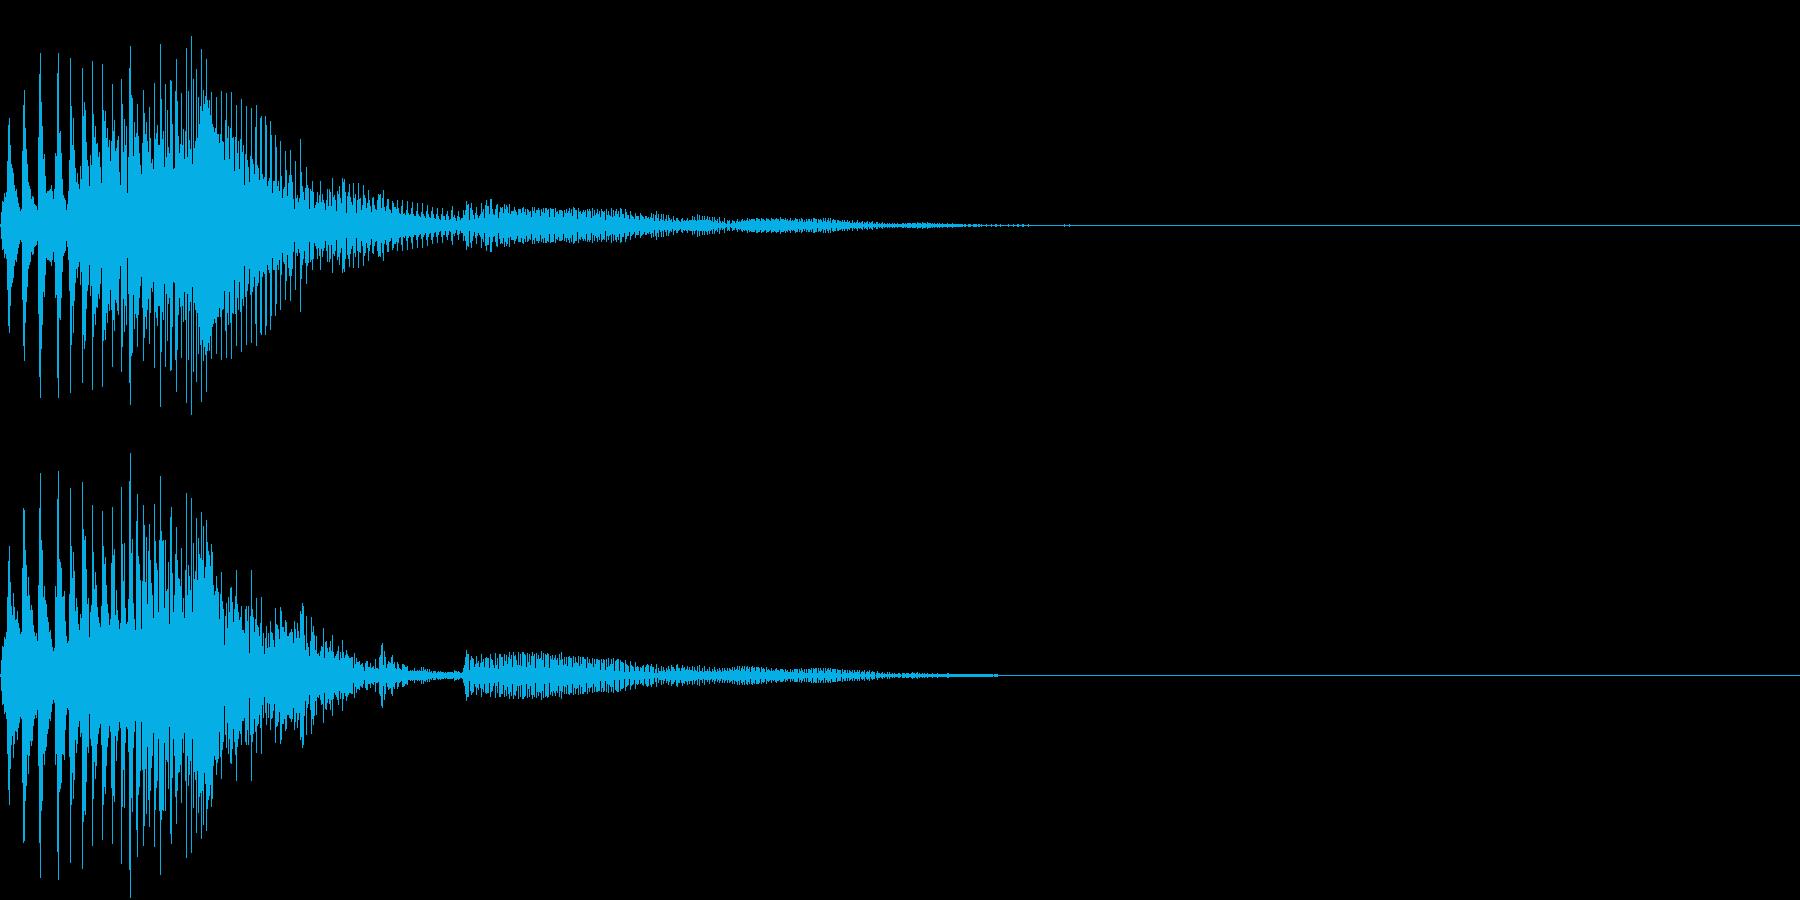 Zako ゲームのザコキャラの鳴き声 3の再生済みの波形